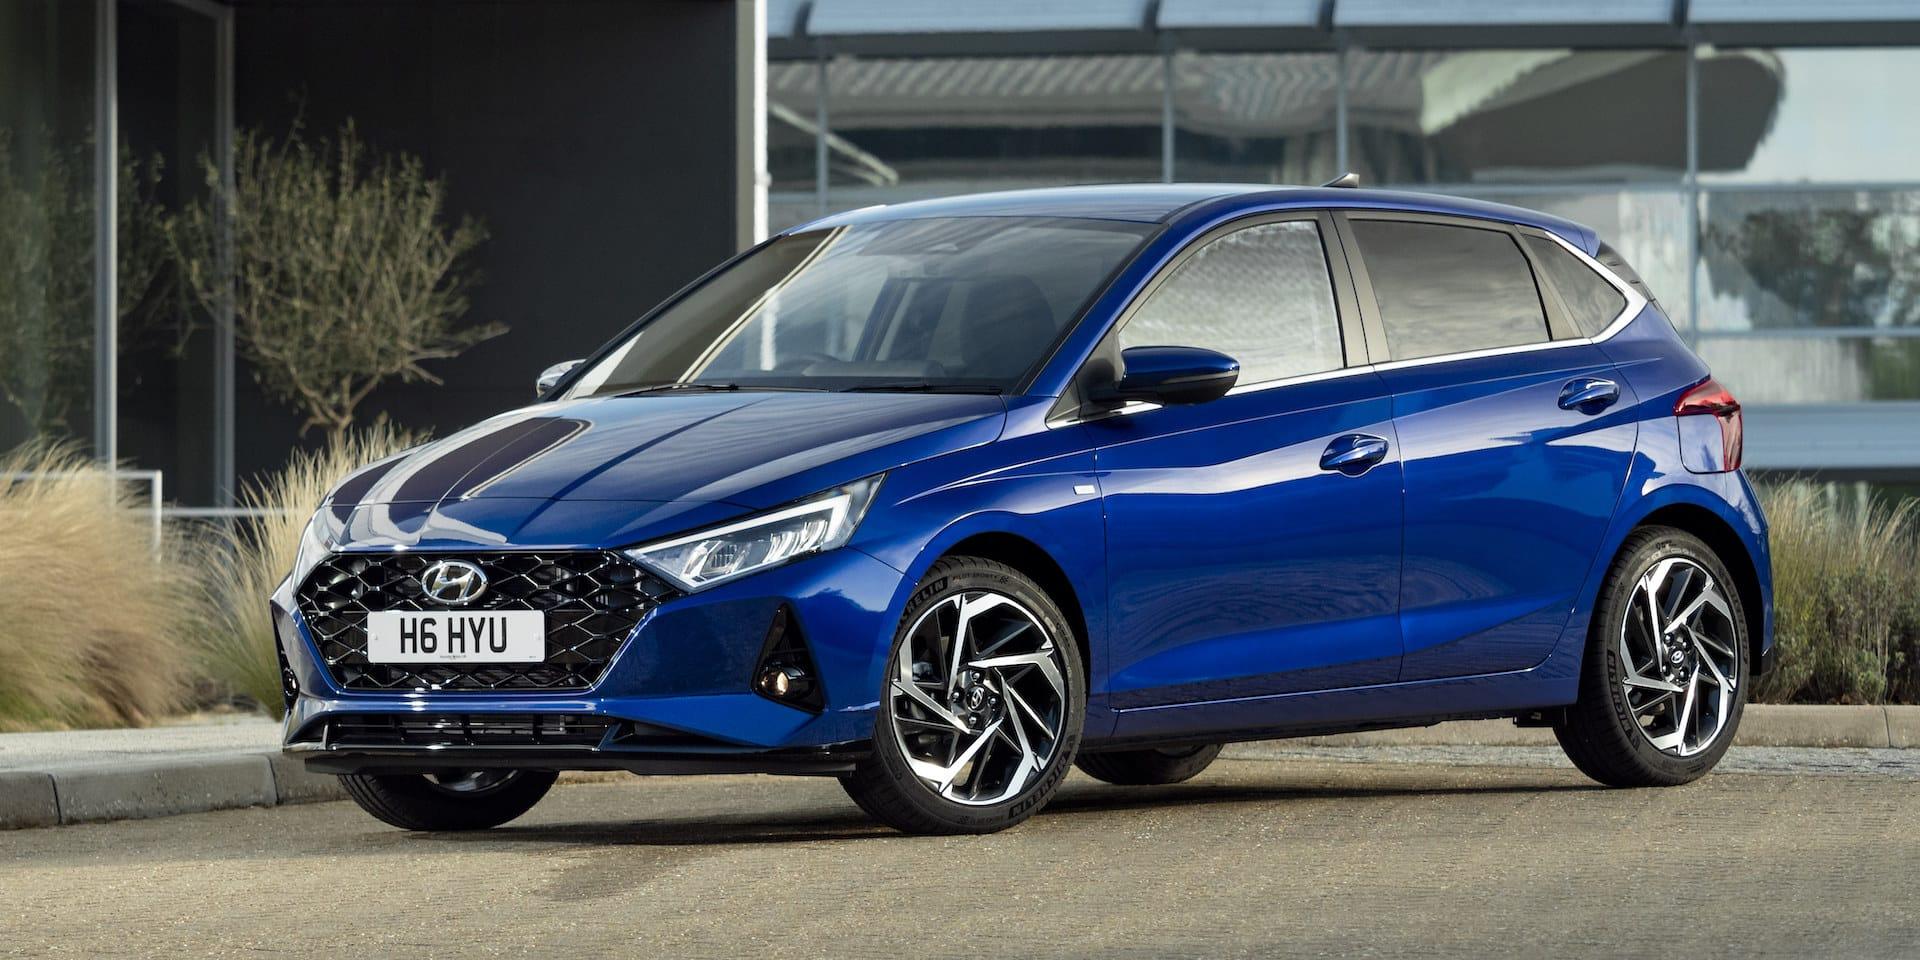 Hyundai i20 (2020 onwards) – Expert Rating